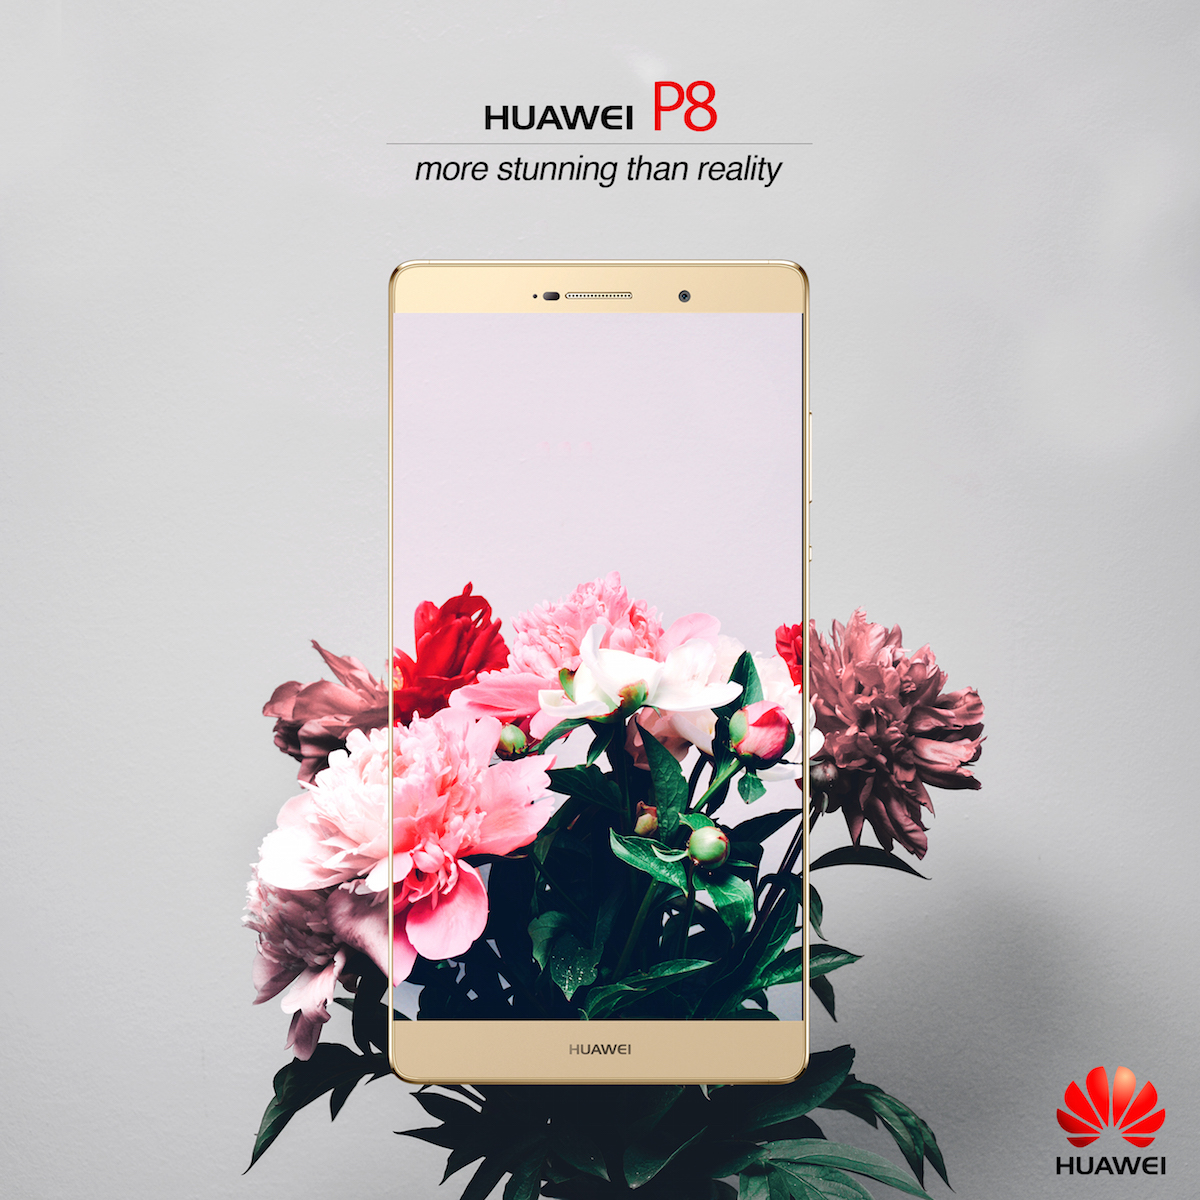 Huawei p8 ad